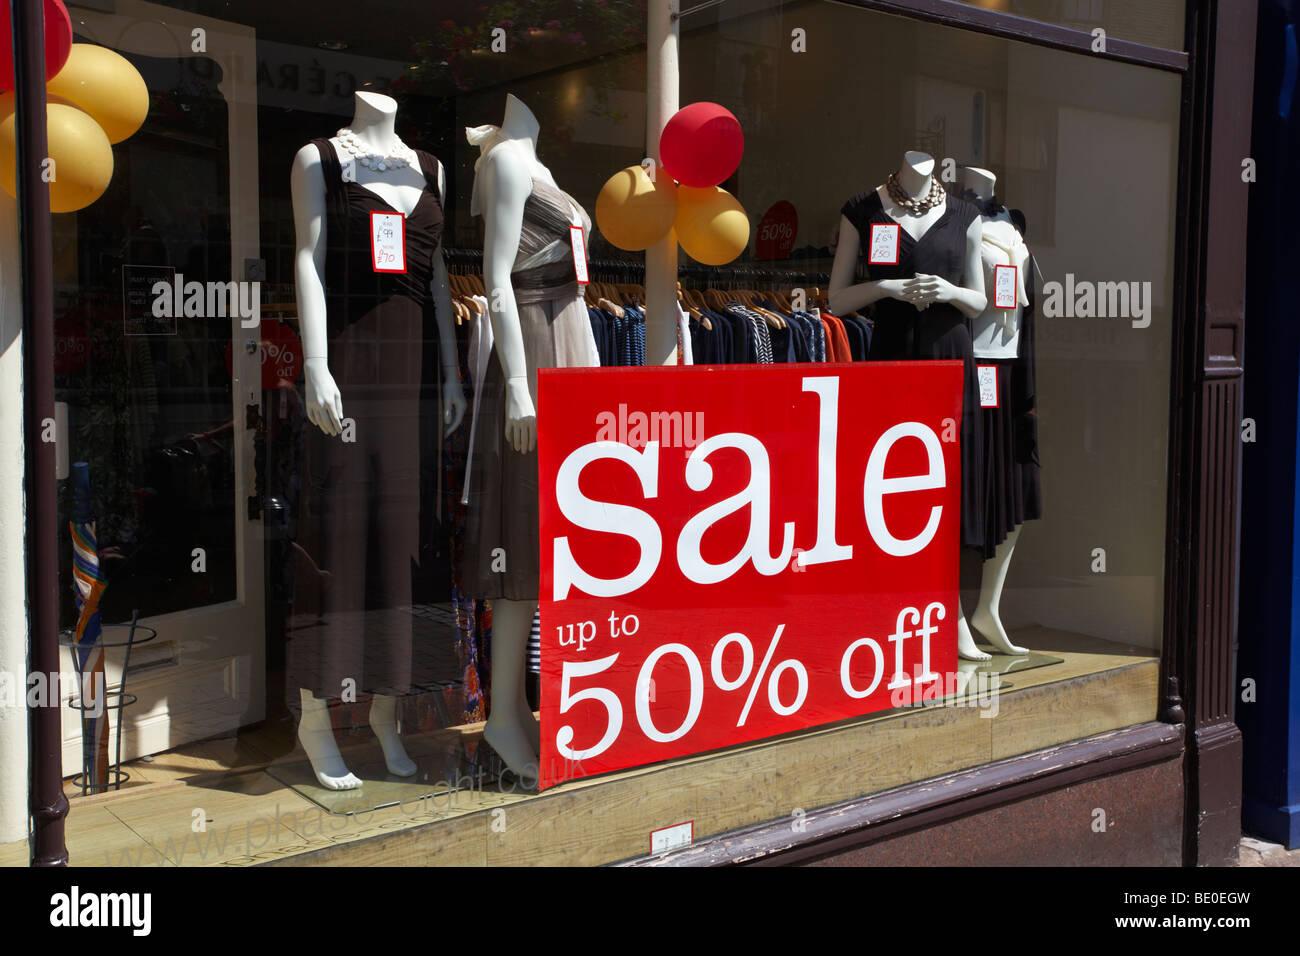 England Suffolk Bury St Edmunds SALE sign in Dress shop window - Stock Image